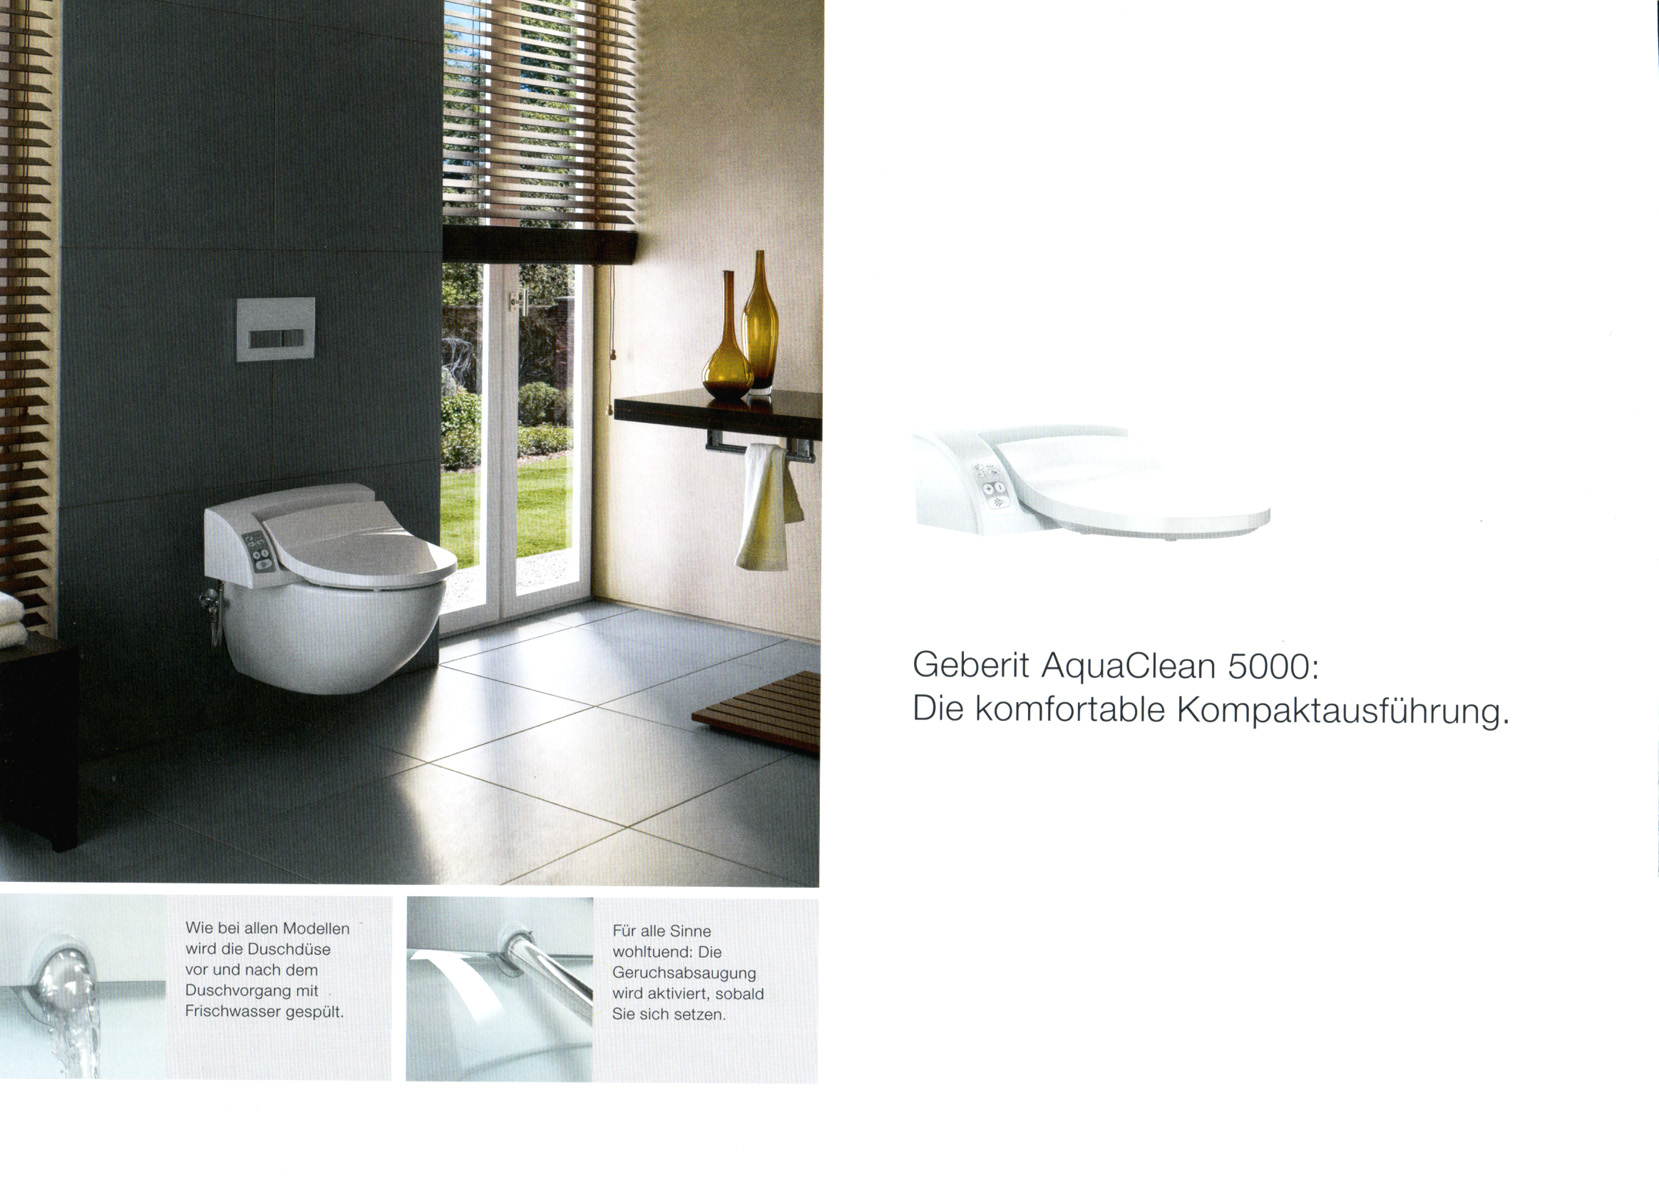 geberit aquaclean. Black Bedroom Furniture Sets. Home Design Ideas